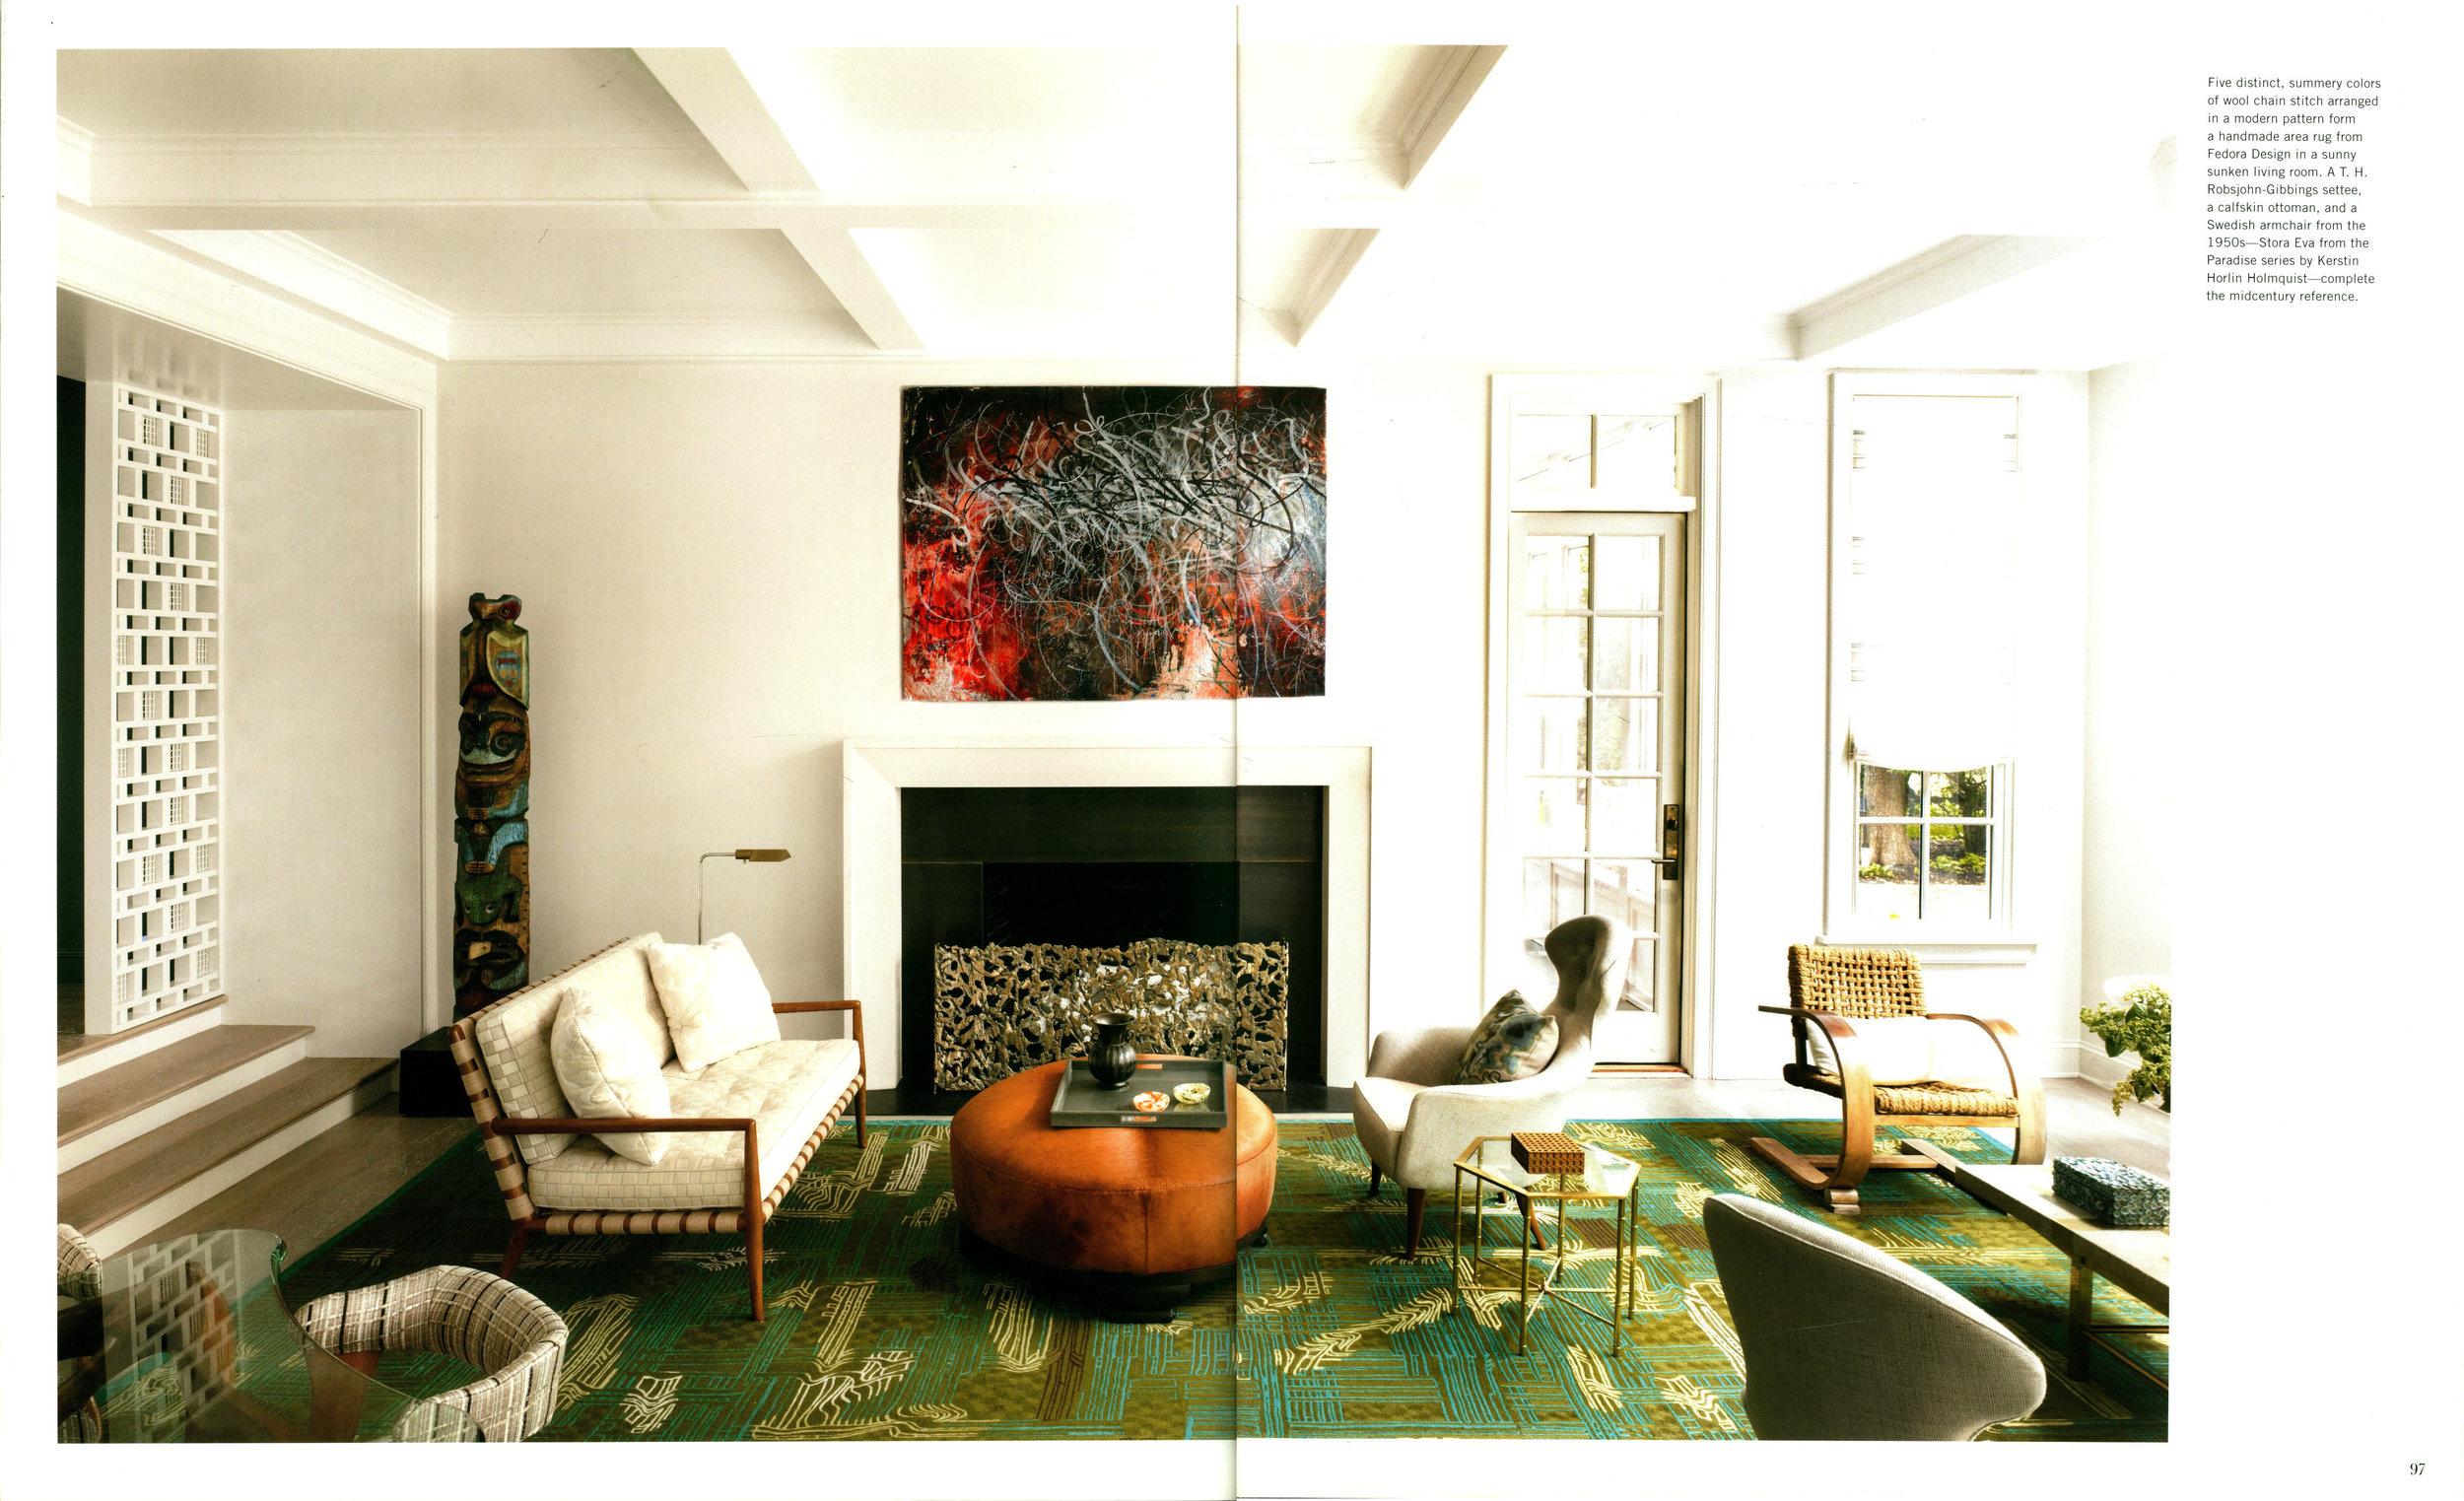 Design in the hamptons spread 2.jpg